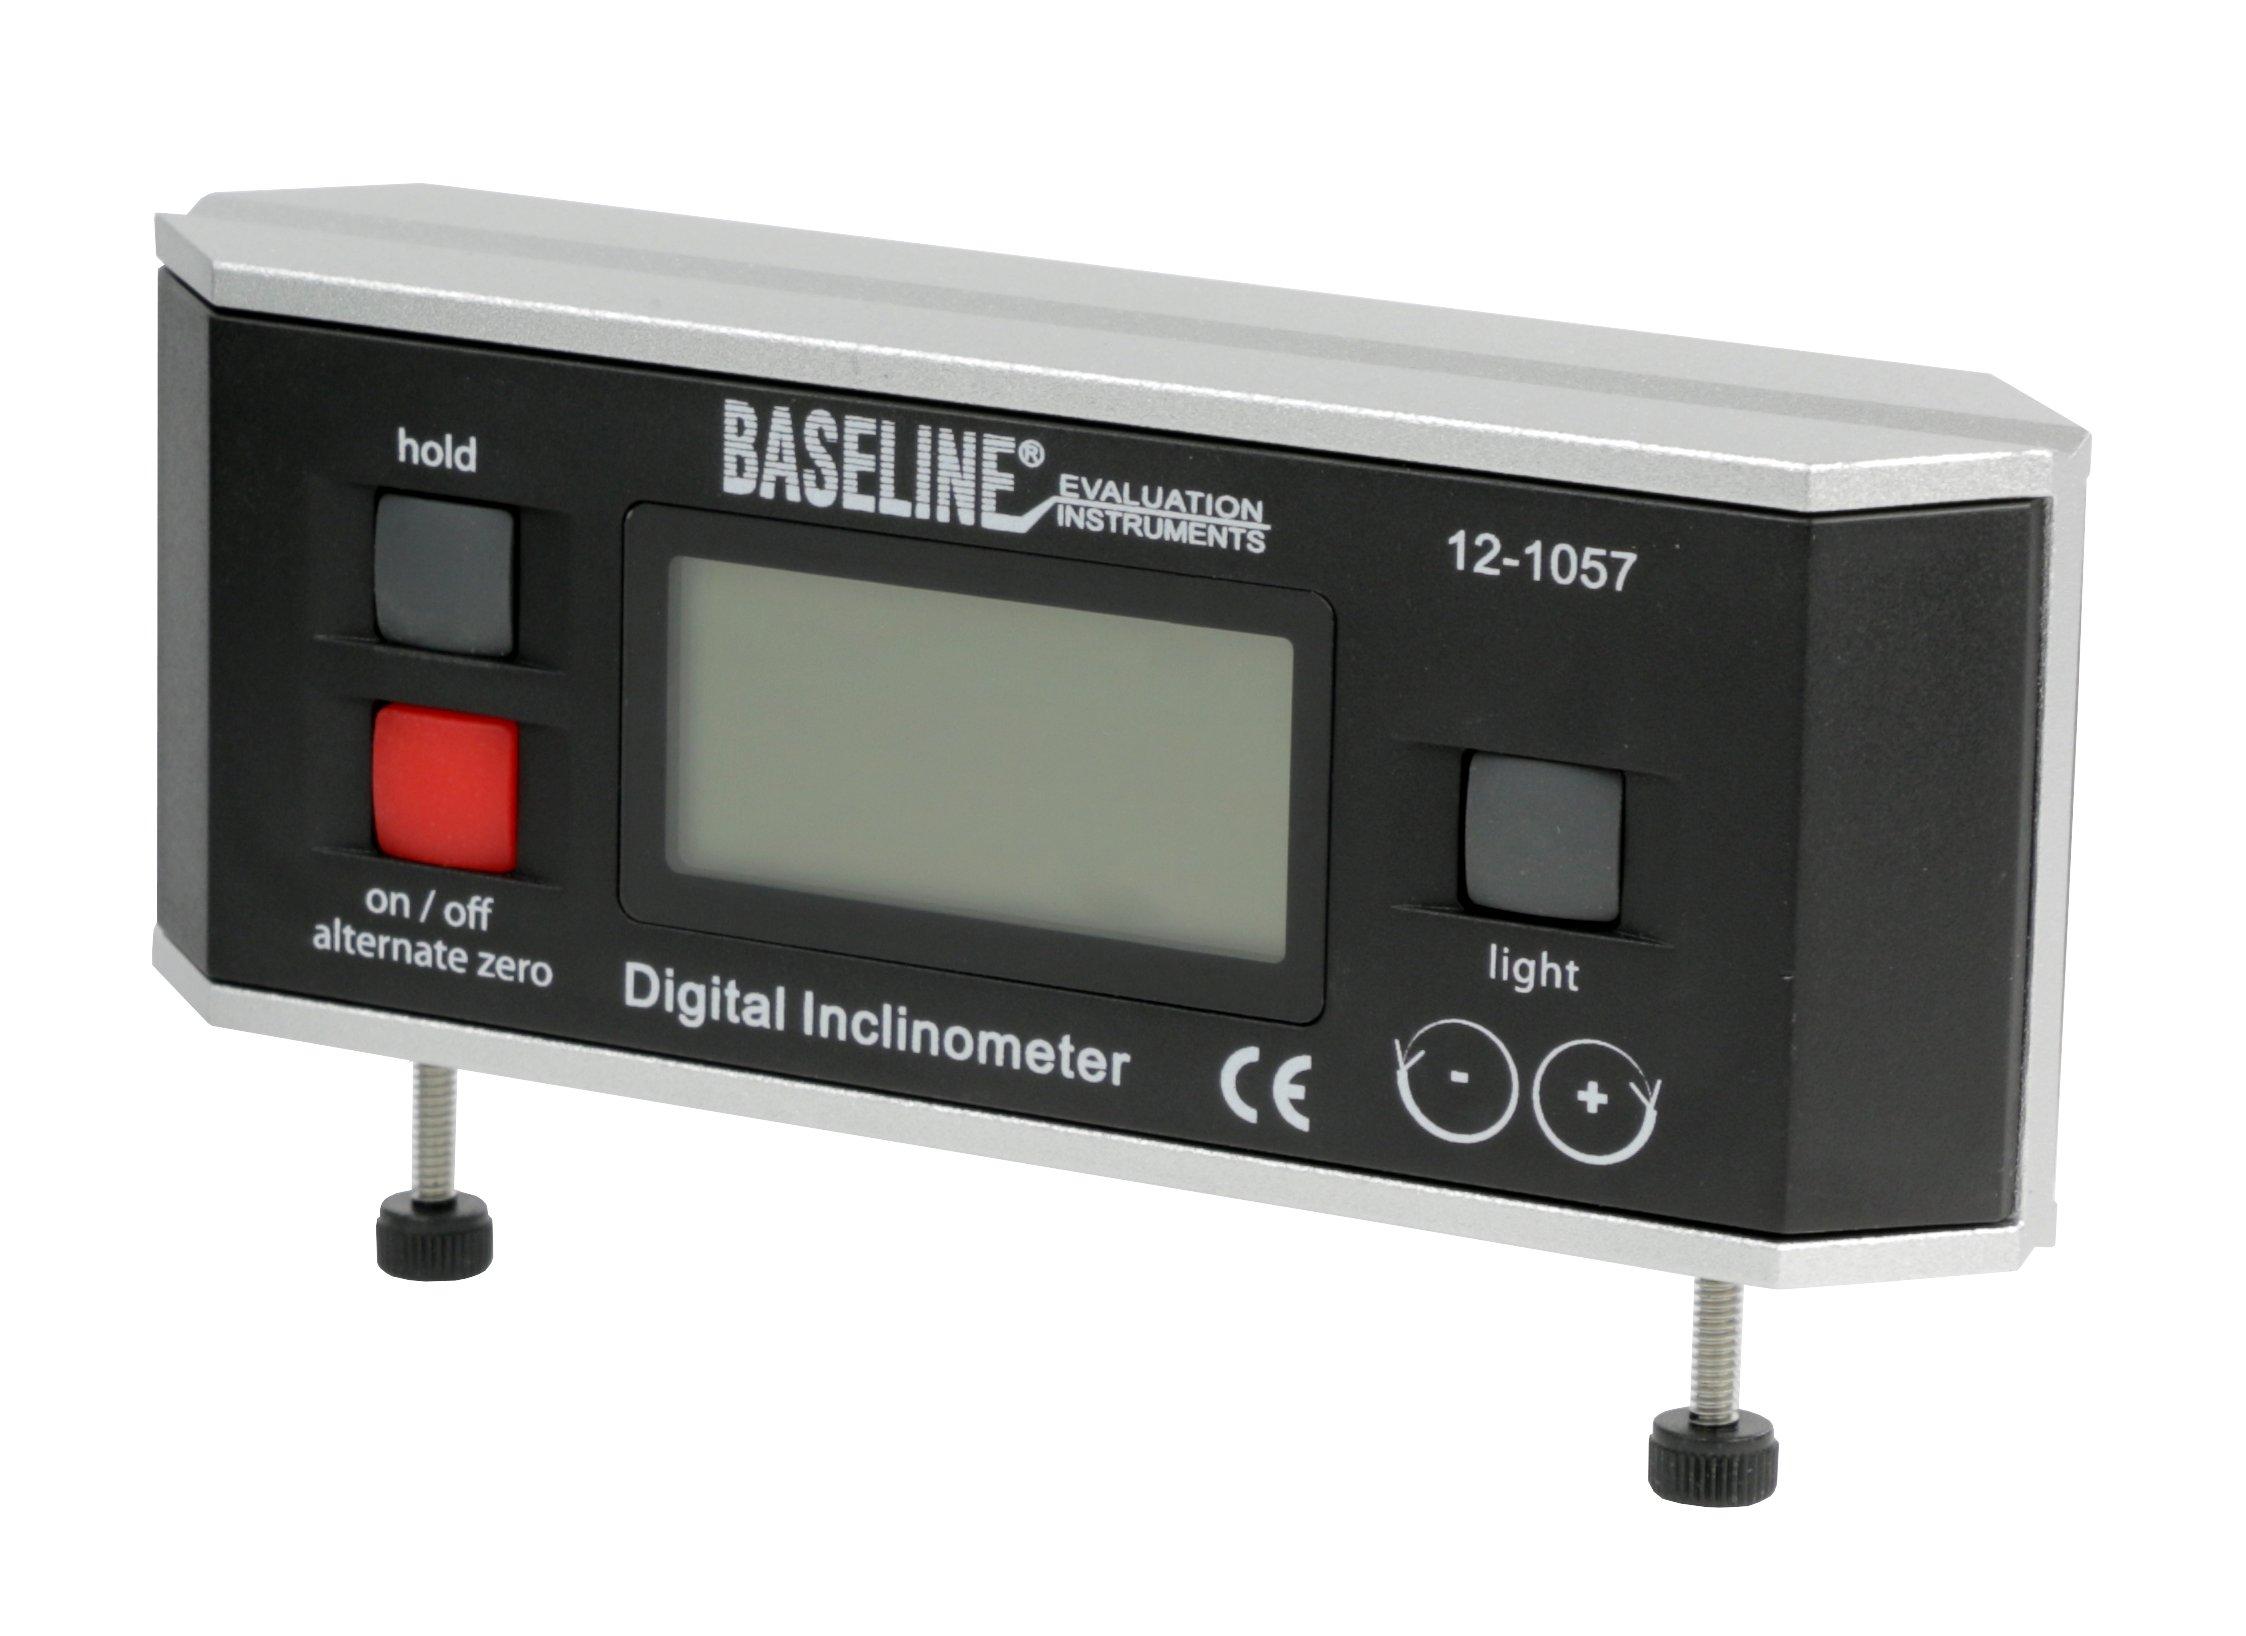 Baseline-12-1057 Digital Inclinometer